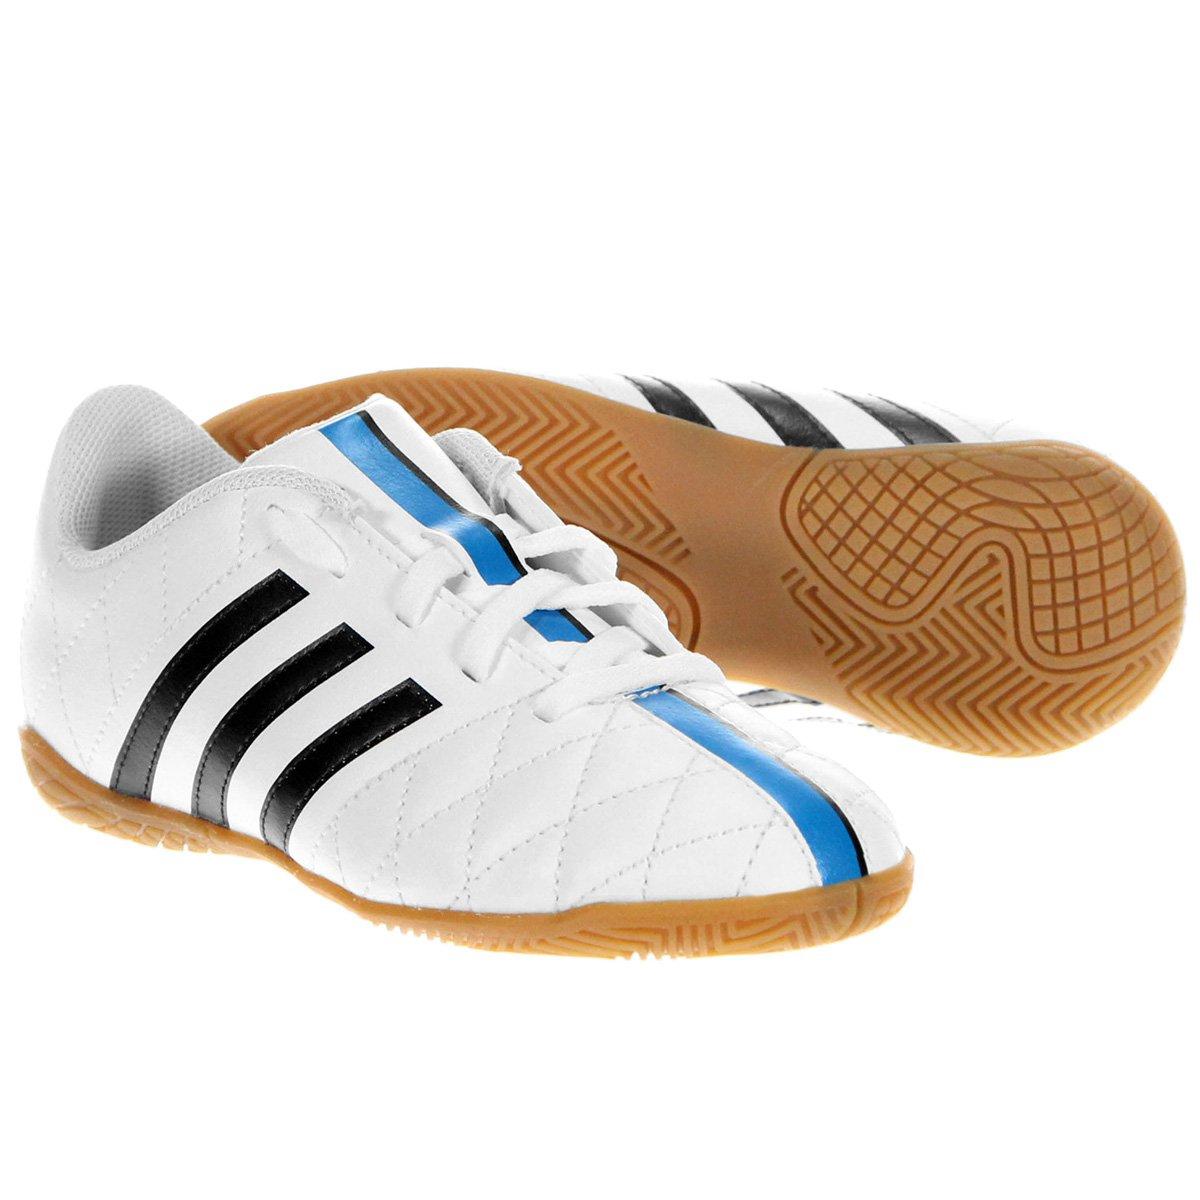 Chuteira Adidas 11 Questra IN Futsal Infantil - Compre Agora  bbb426521436c